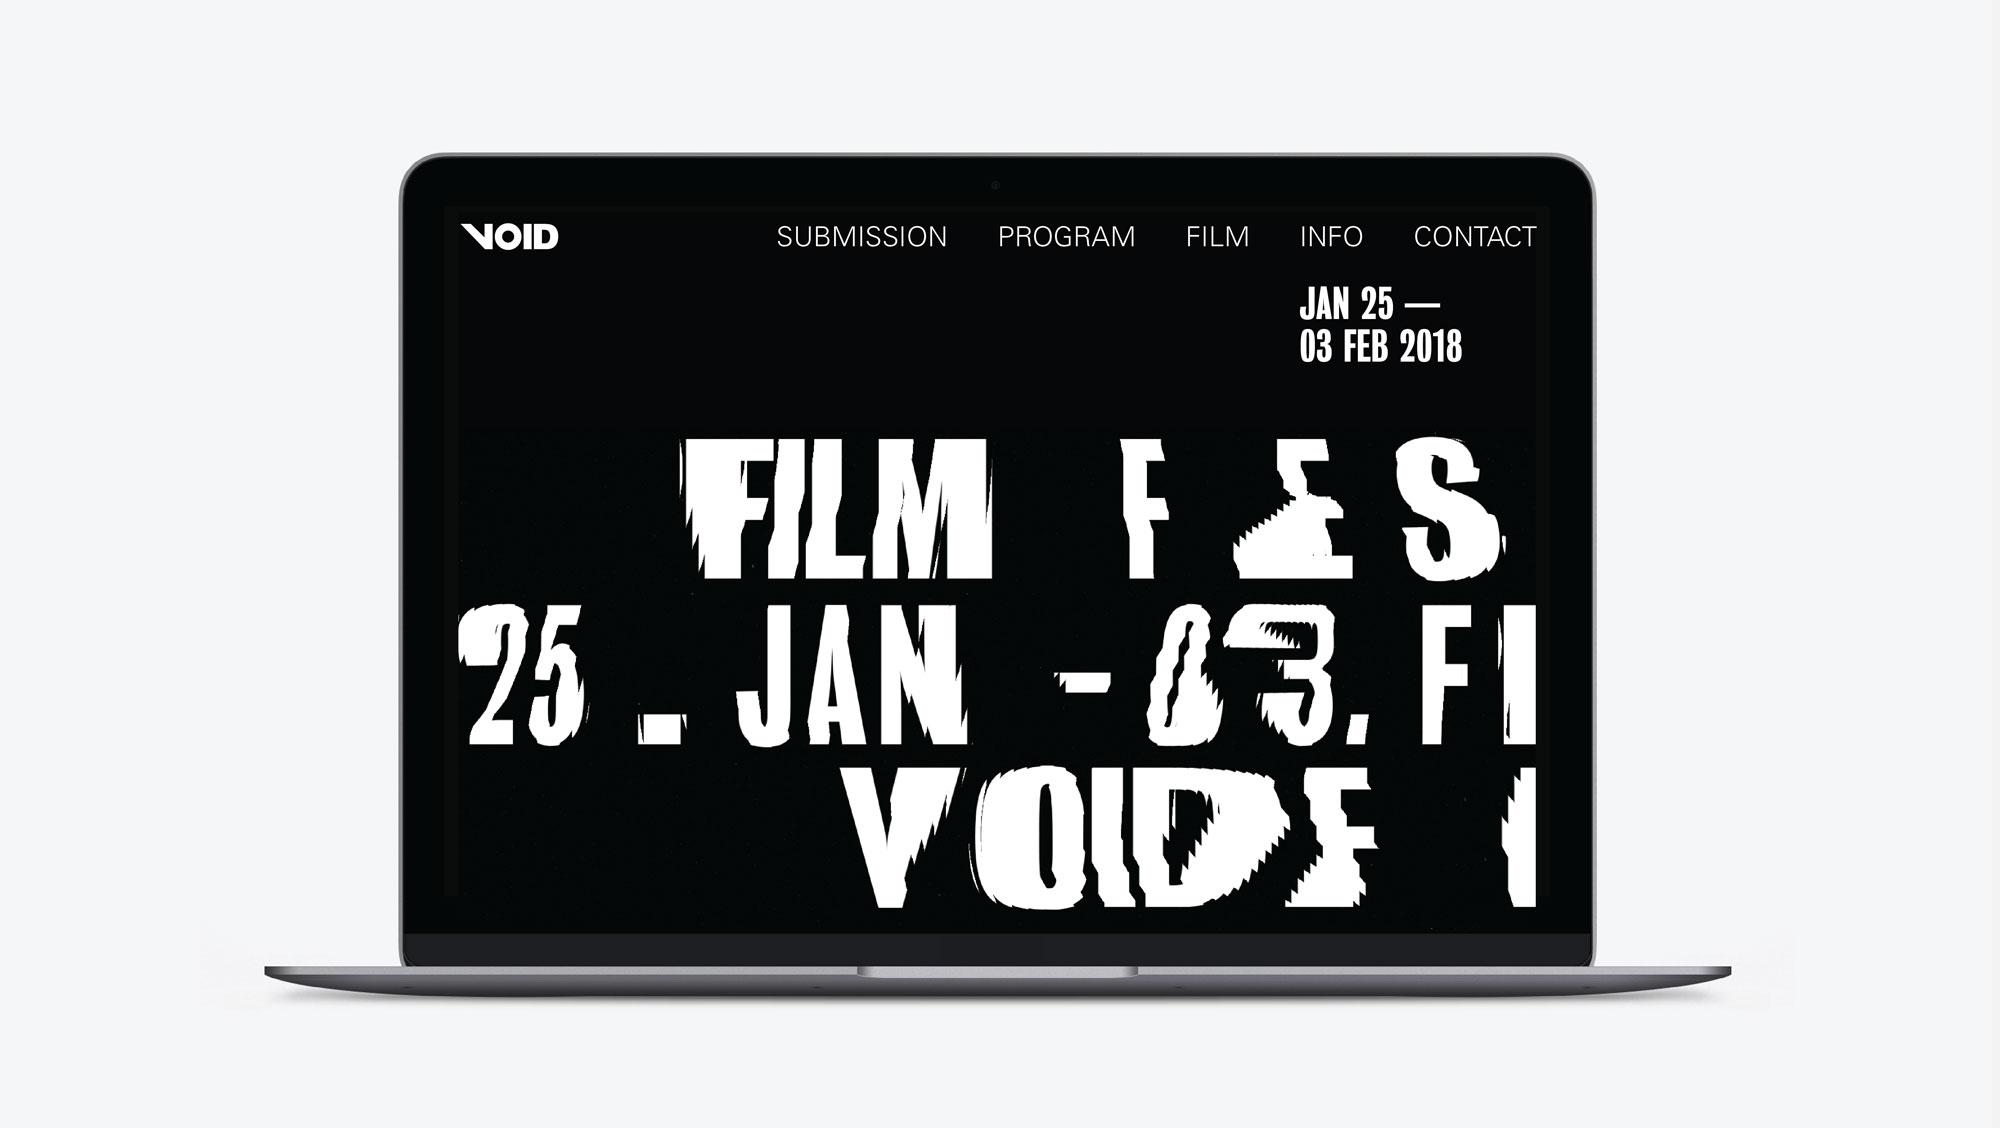 Fuhr_Studio_Design_og_branding_bureau_VOID_Visuel_Identitet_04.jpg